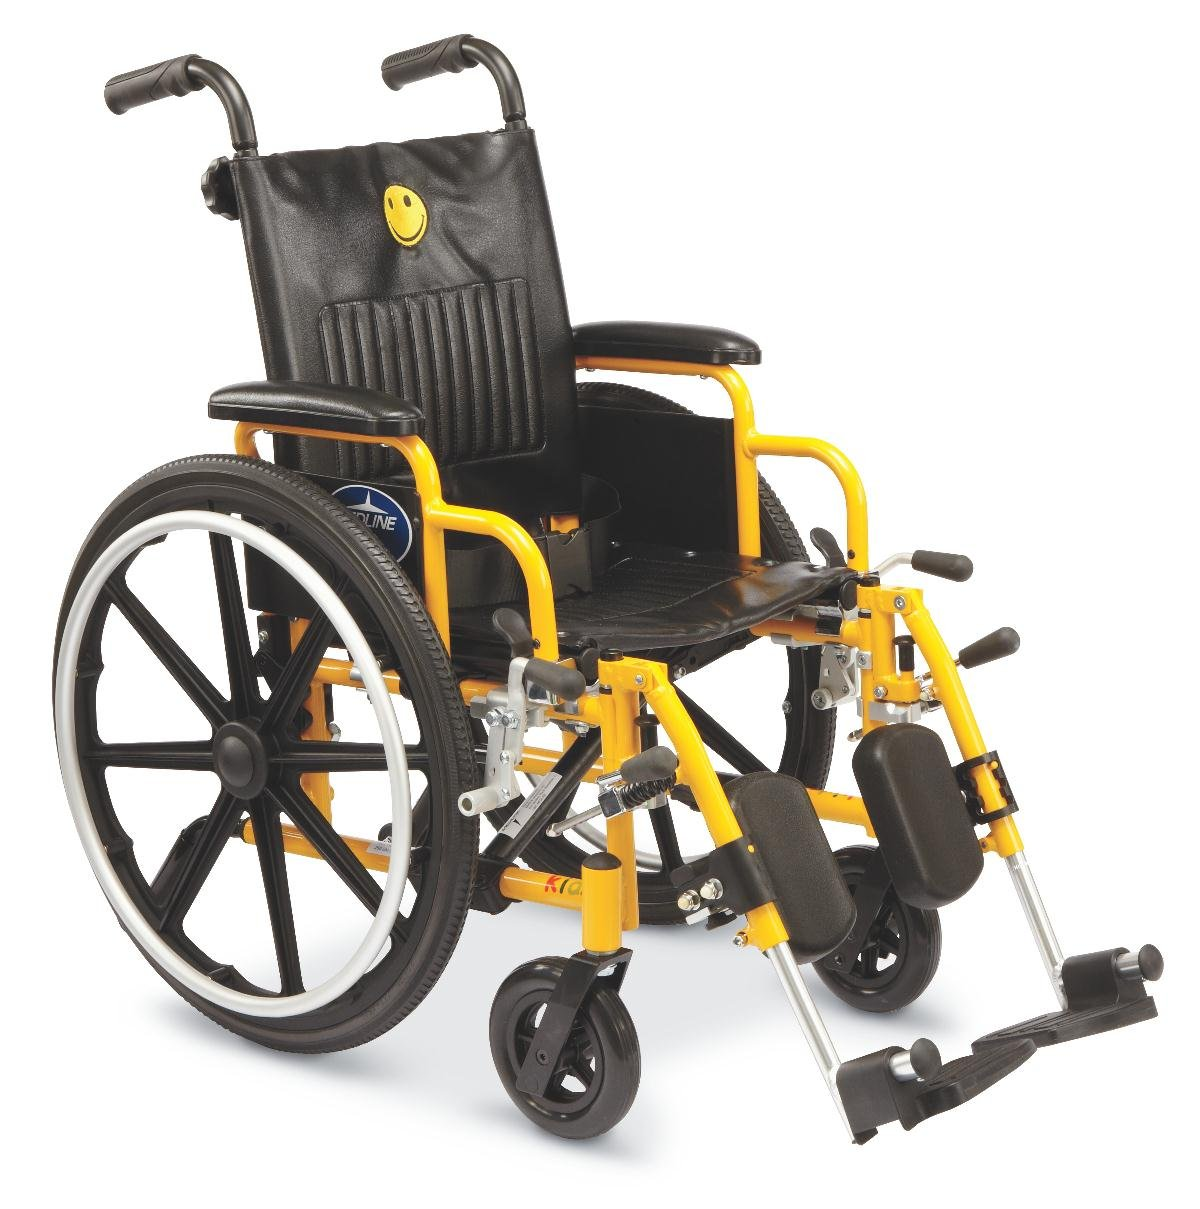 Medline Pediatric Wheelchair, 14'' Wide Seat, Swing-Bag Desk-Length Arms, Elevating Legrests, Yellow Frame